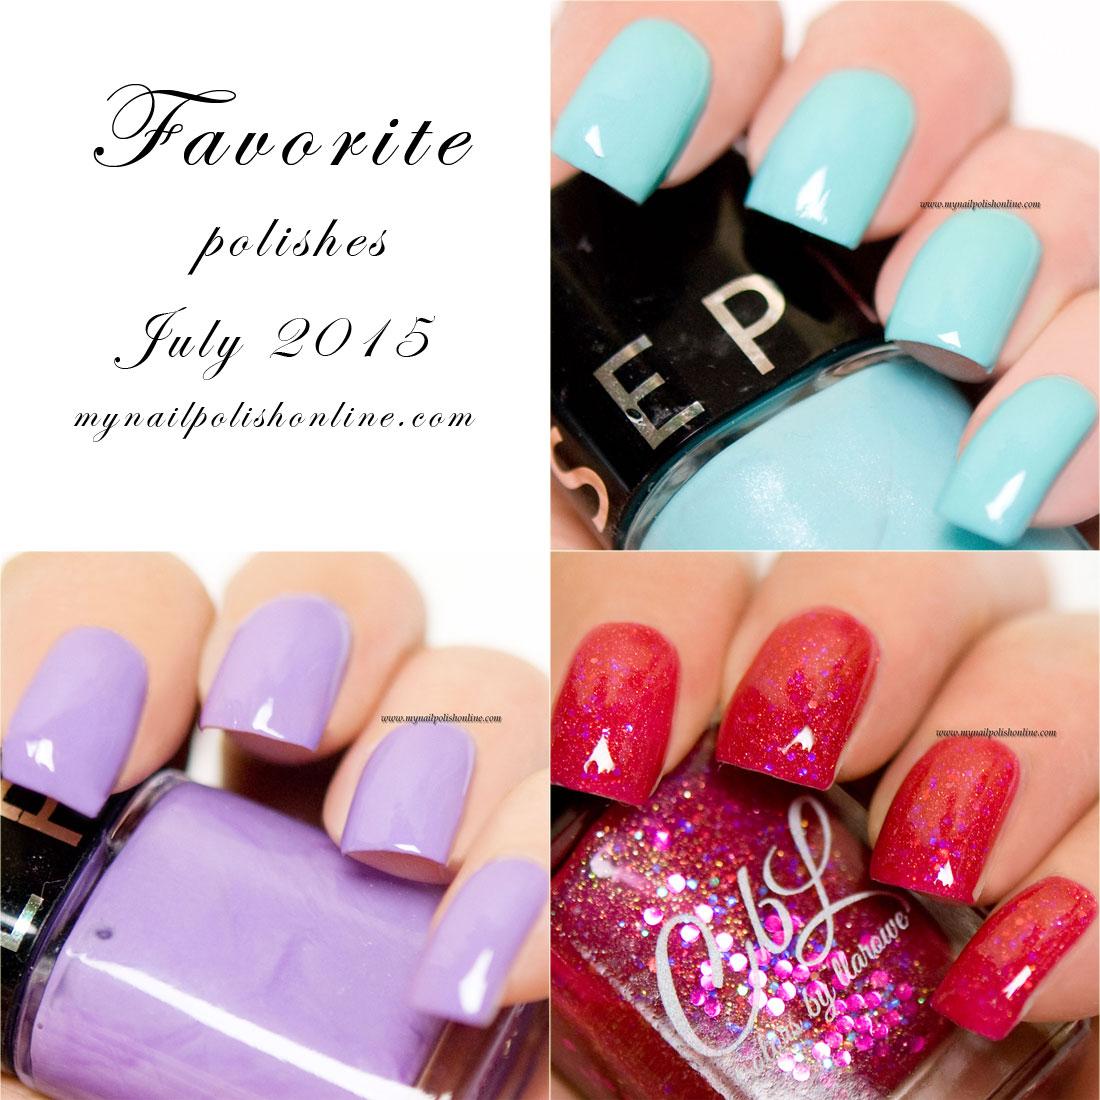 Favorite polishes July 2015